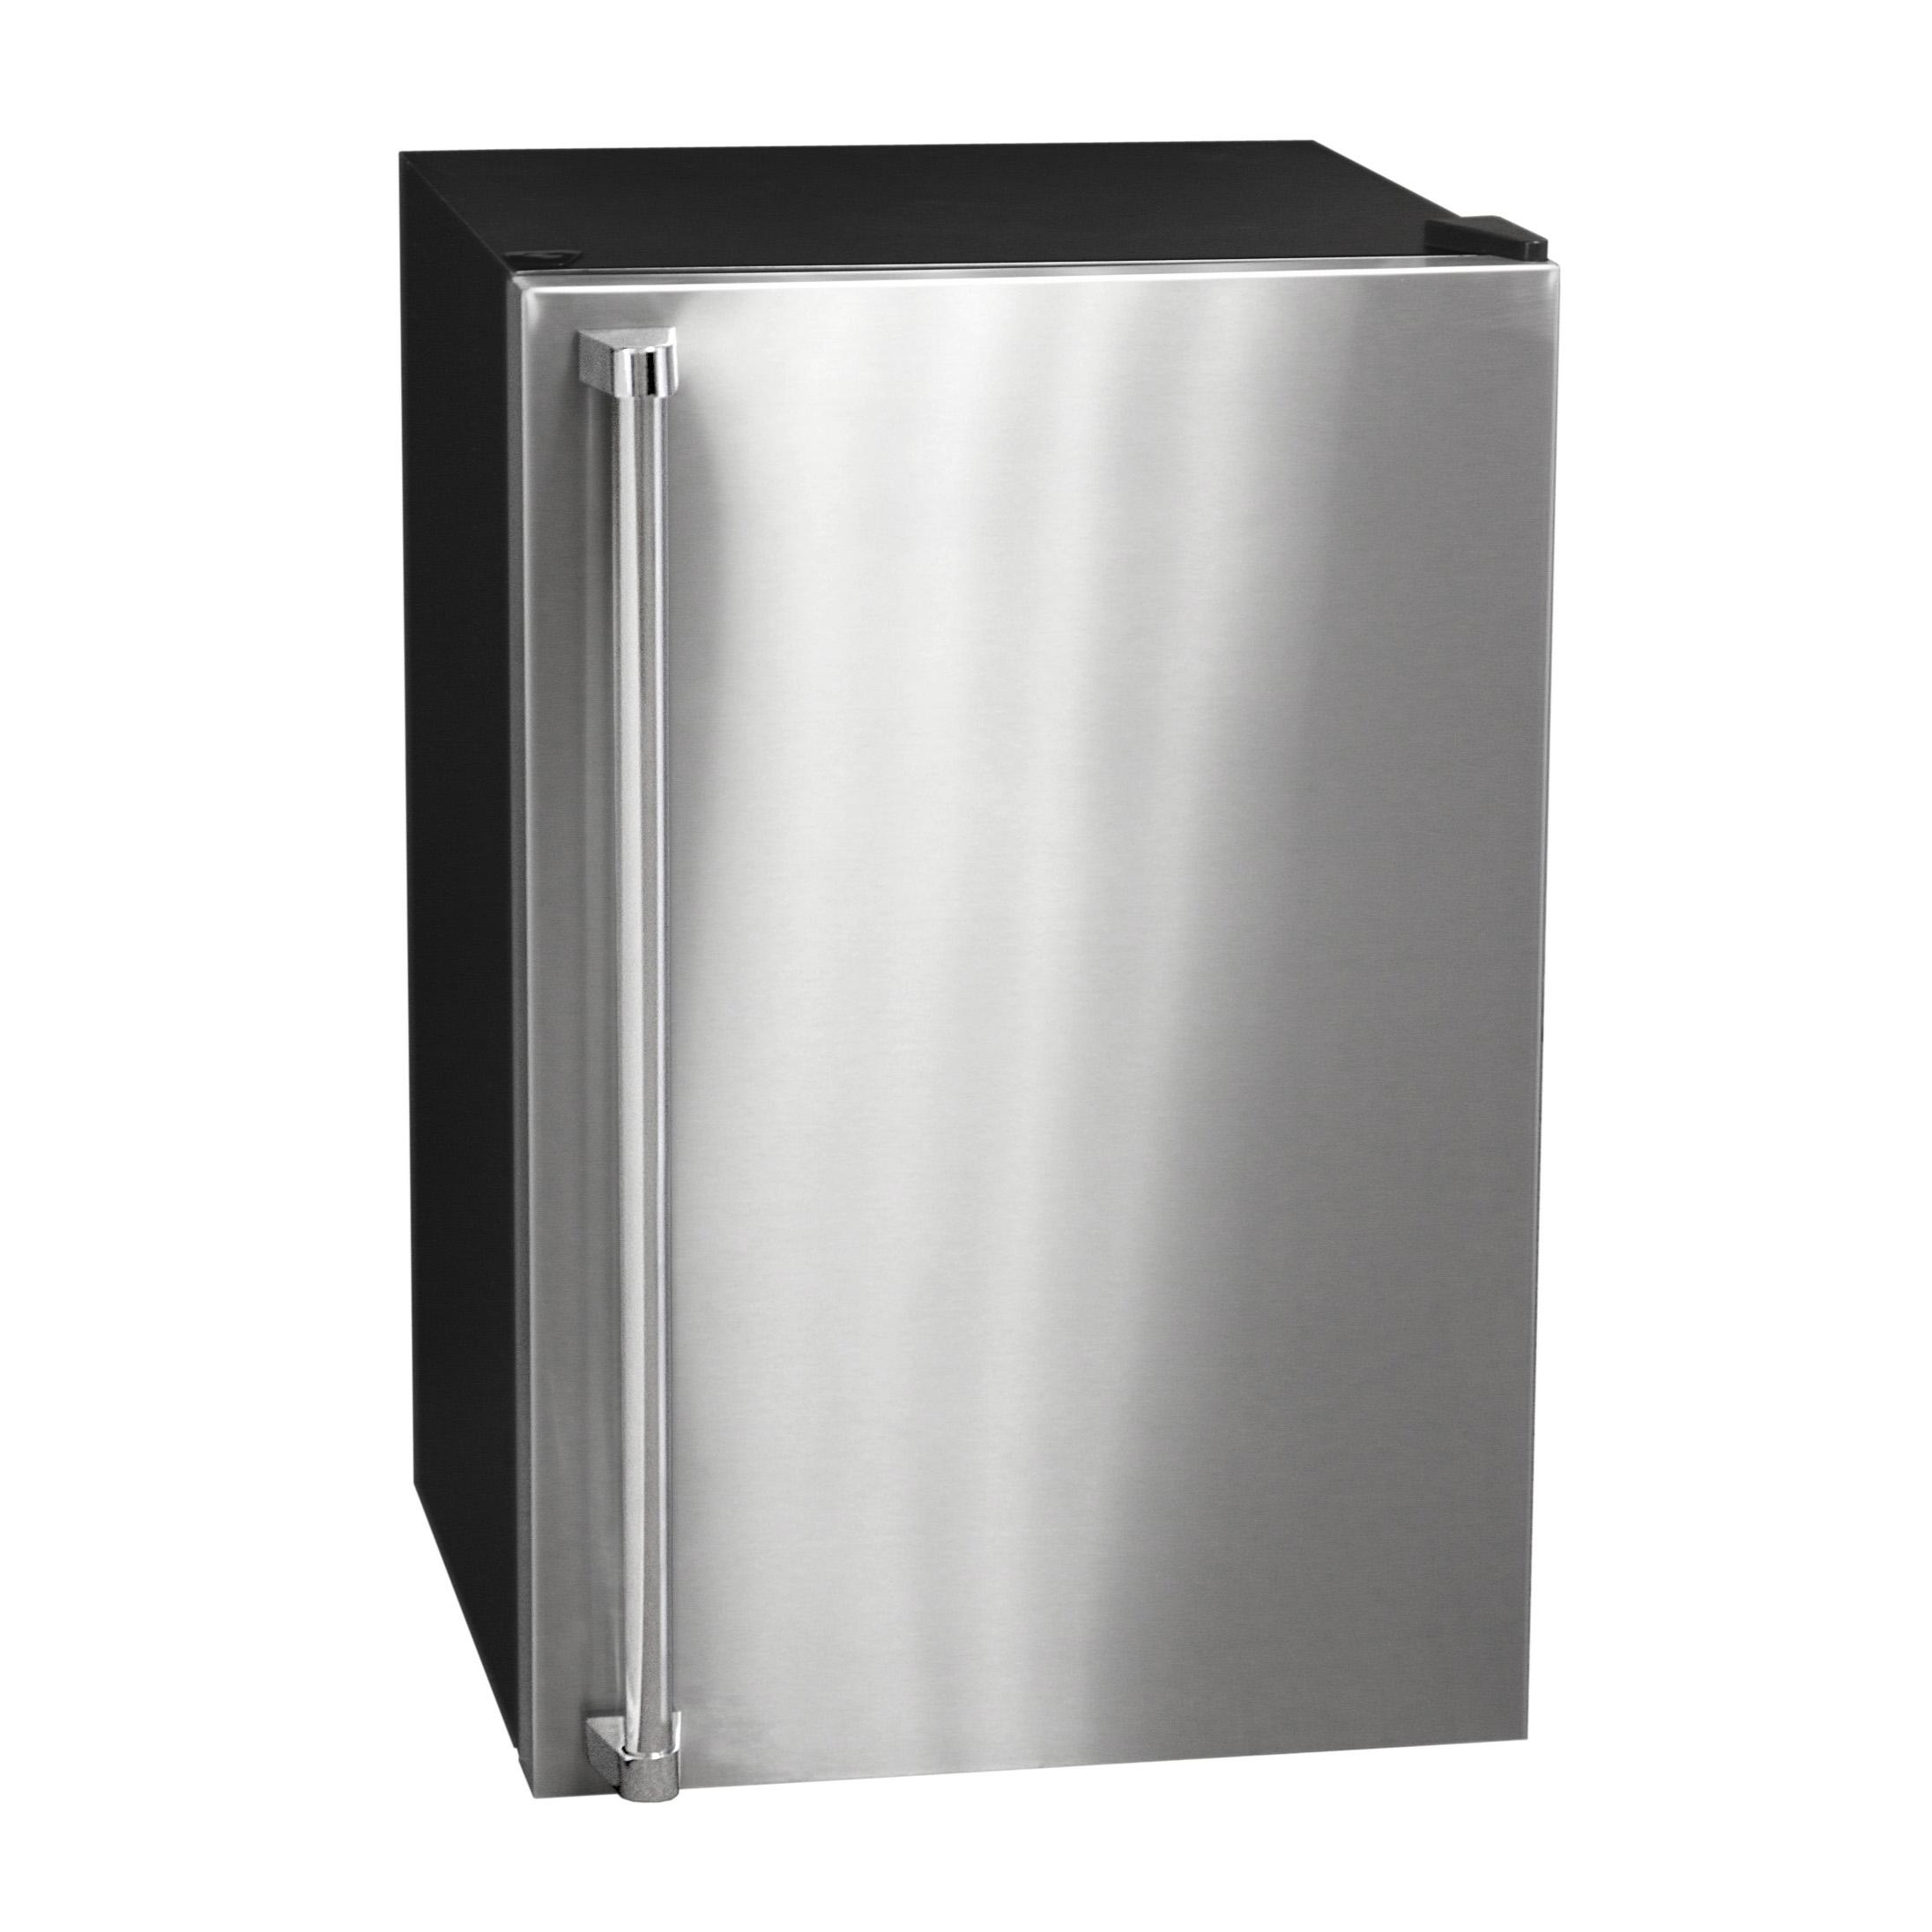 Stainless Steel Refridgerators Summerset Stainless Steel Refrigerator Door Sleeve Upgrade Ssrsl 1